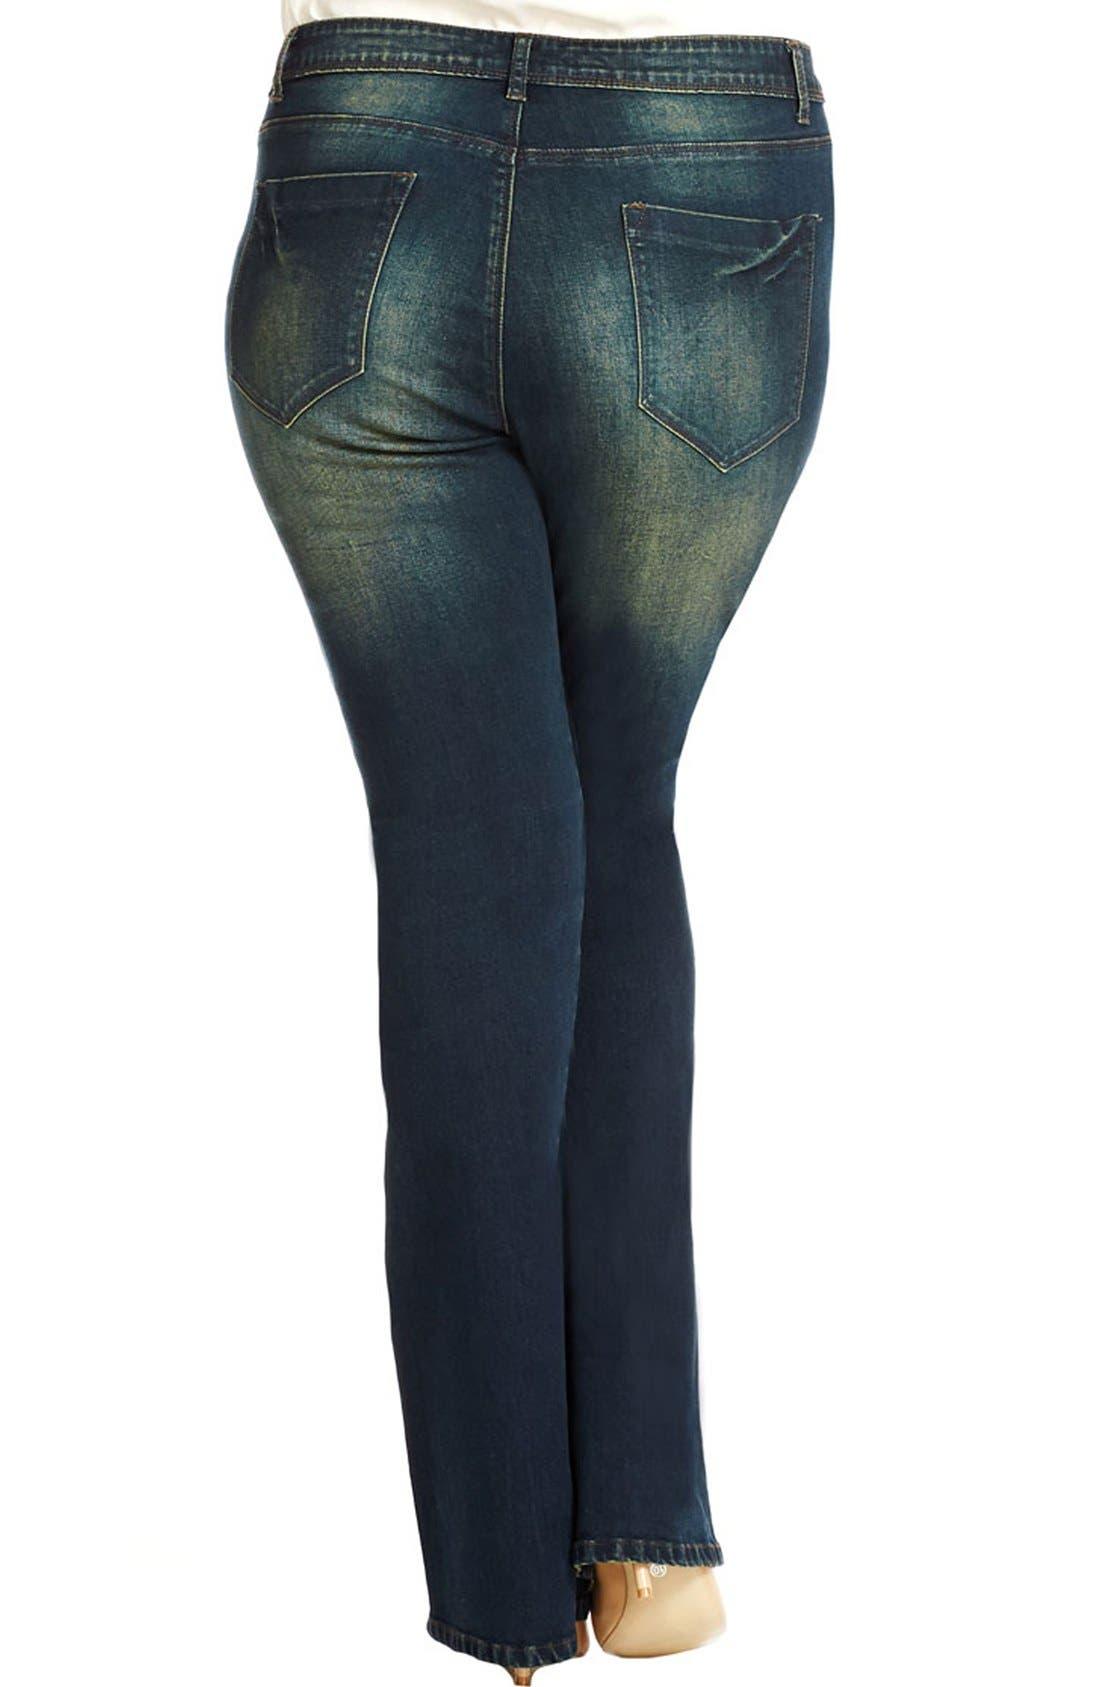 Alternate Image 2  - City Chic 'Dirty Wash' Stretch Bootcut Jeans (Dark Denim) (Plus Size)